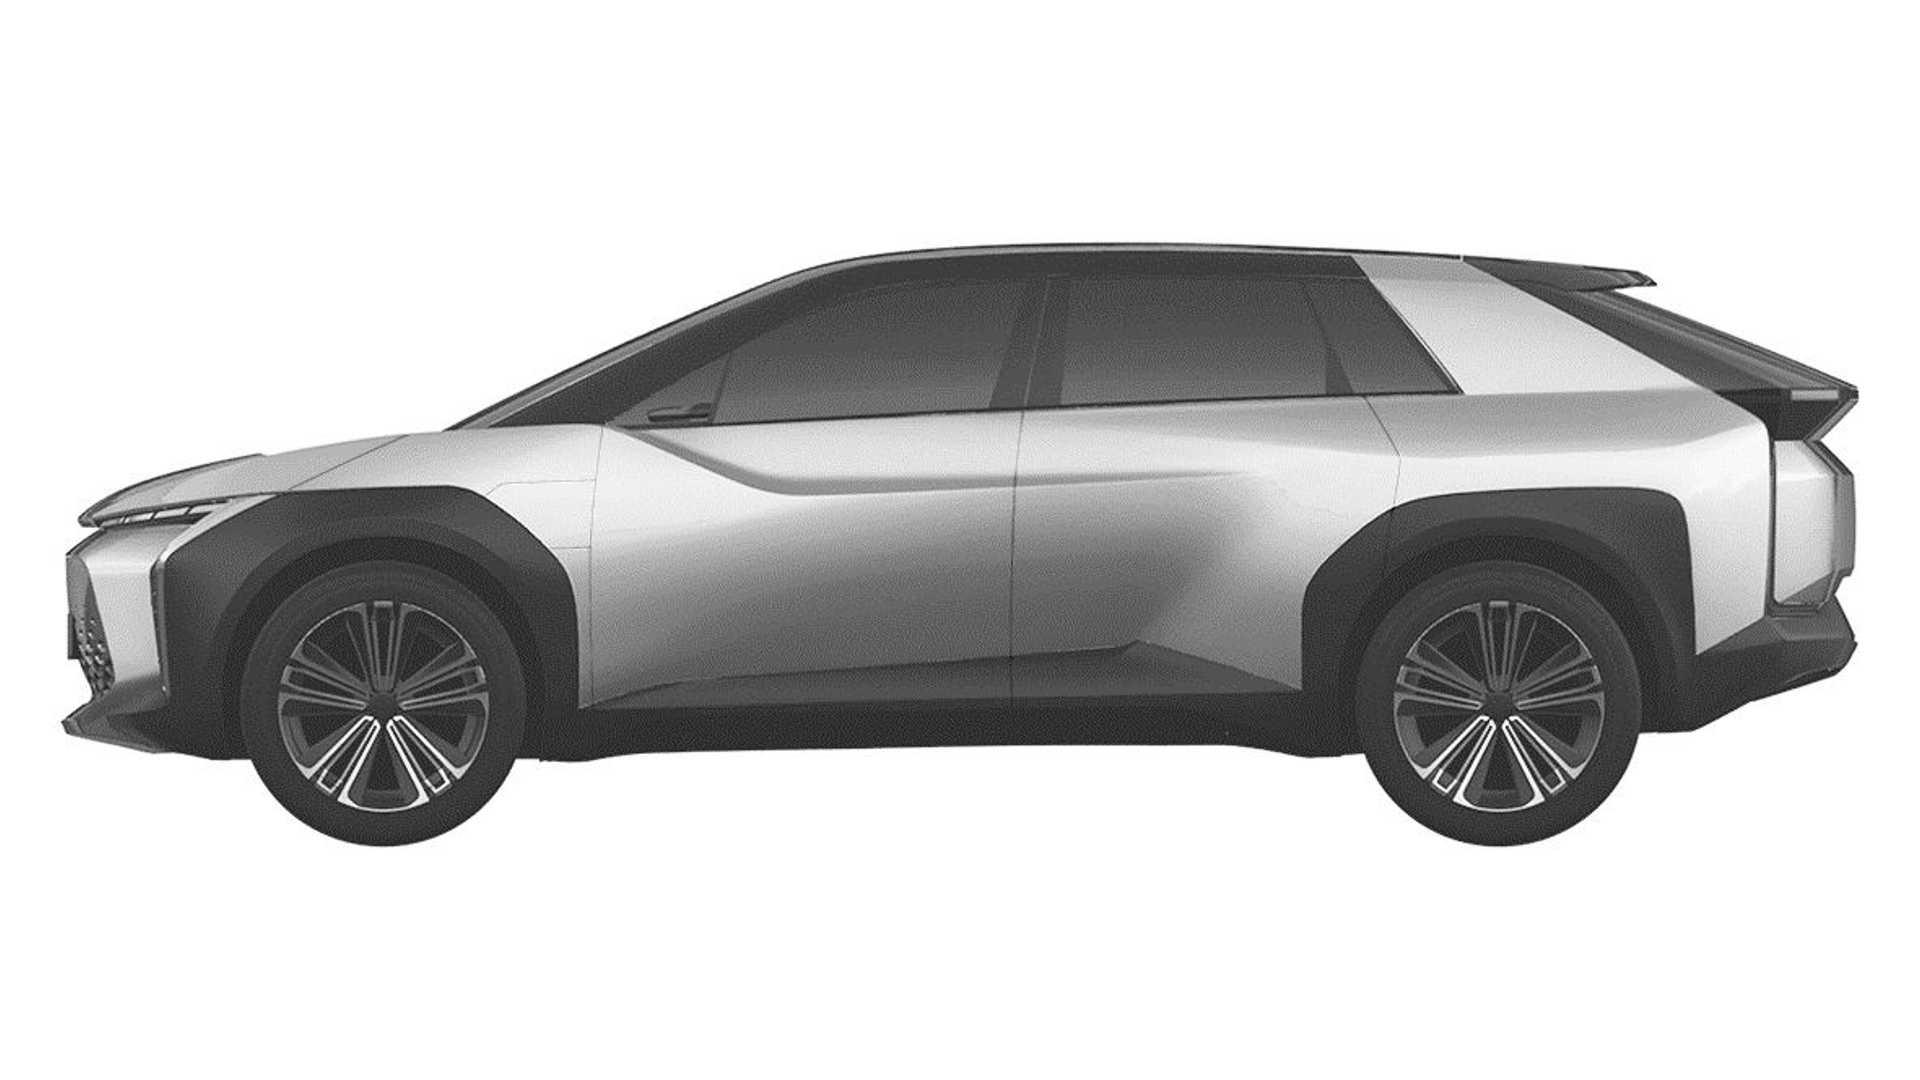 Toyota-Crossover-Design-Trademark-patents-3